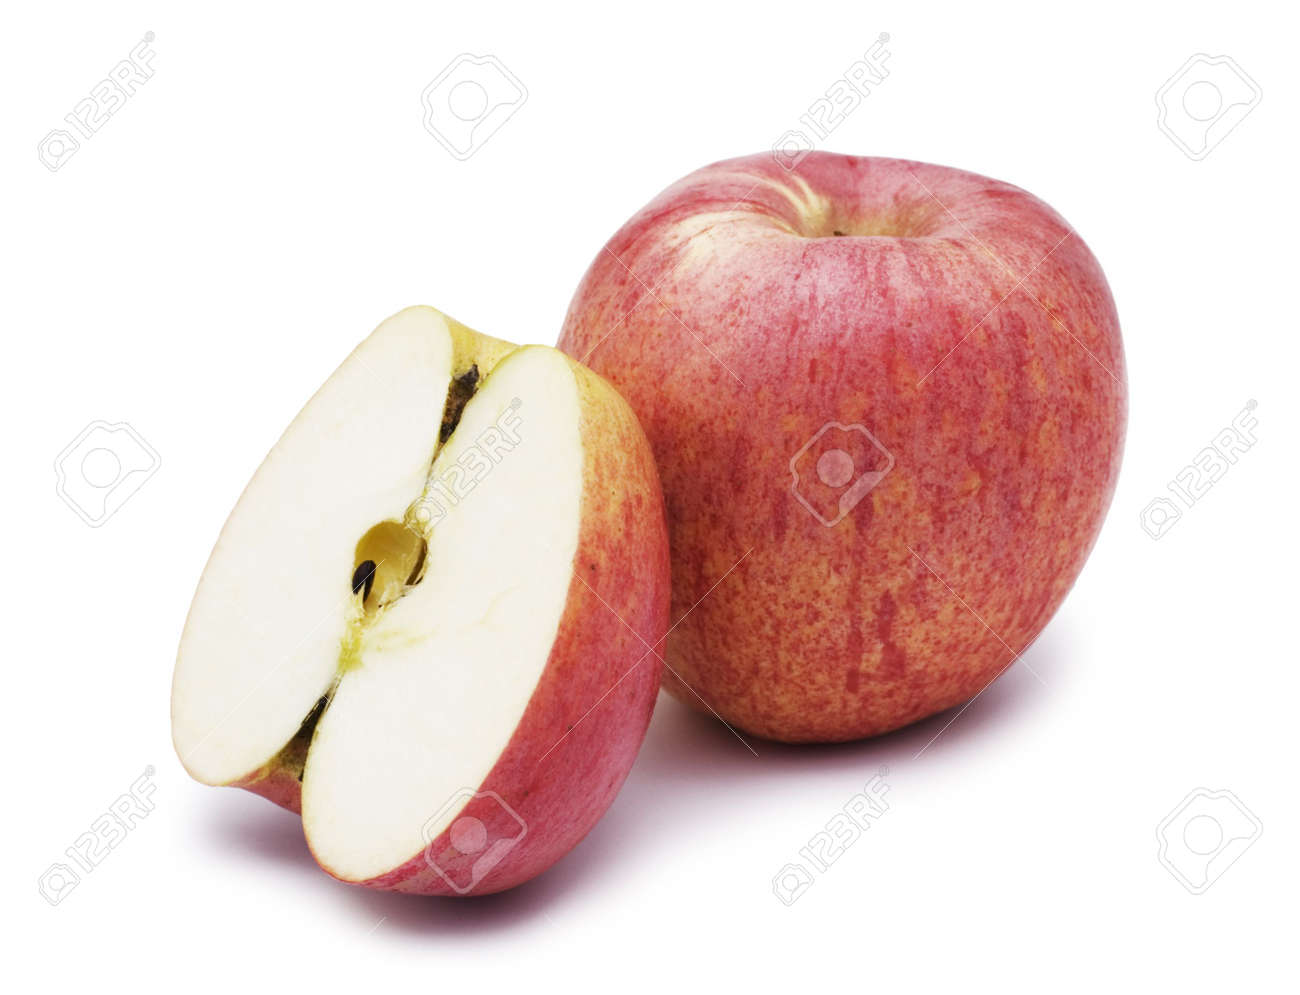 apple isolated over white background Stock Photo - 2538630